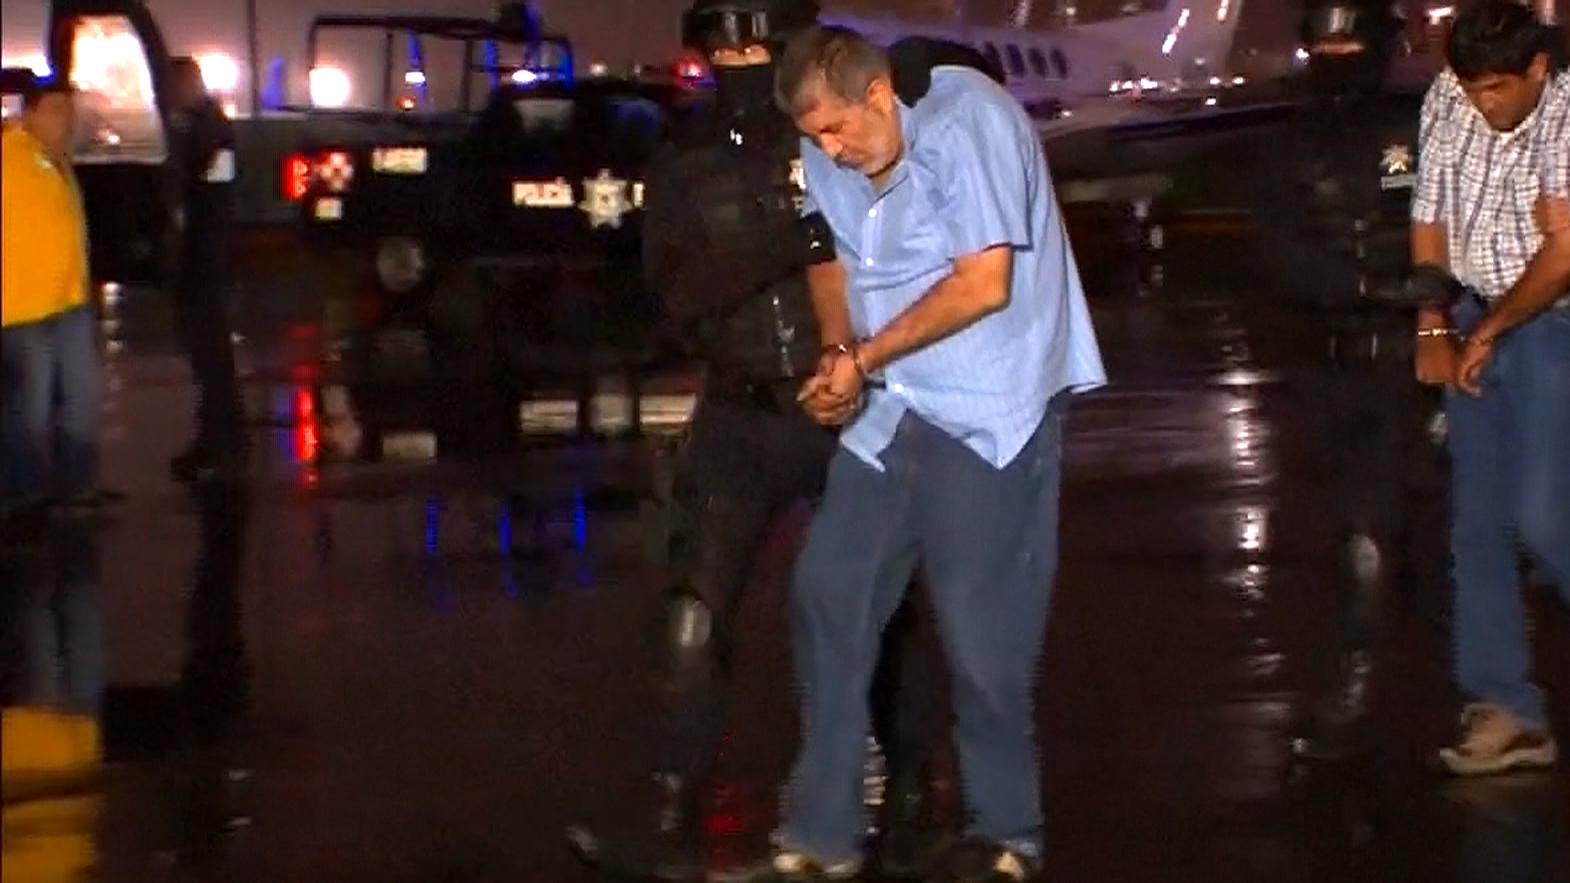 juarez cartel leader vicente carrillo fuentes arrested in mexico. Black Bedroom Furniture Sets. Home Design Ideas